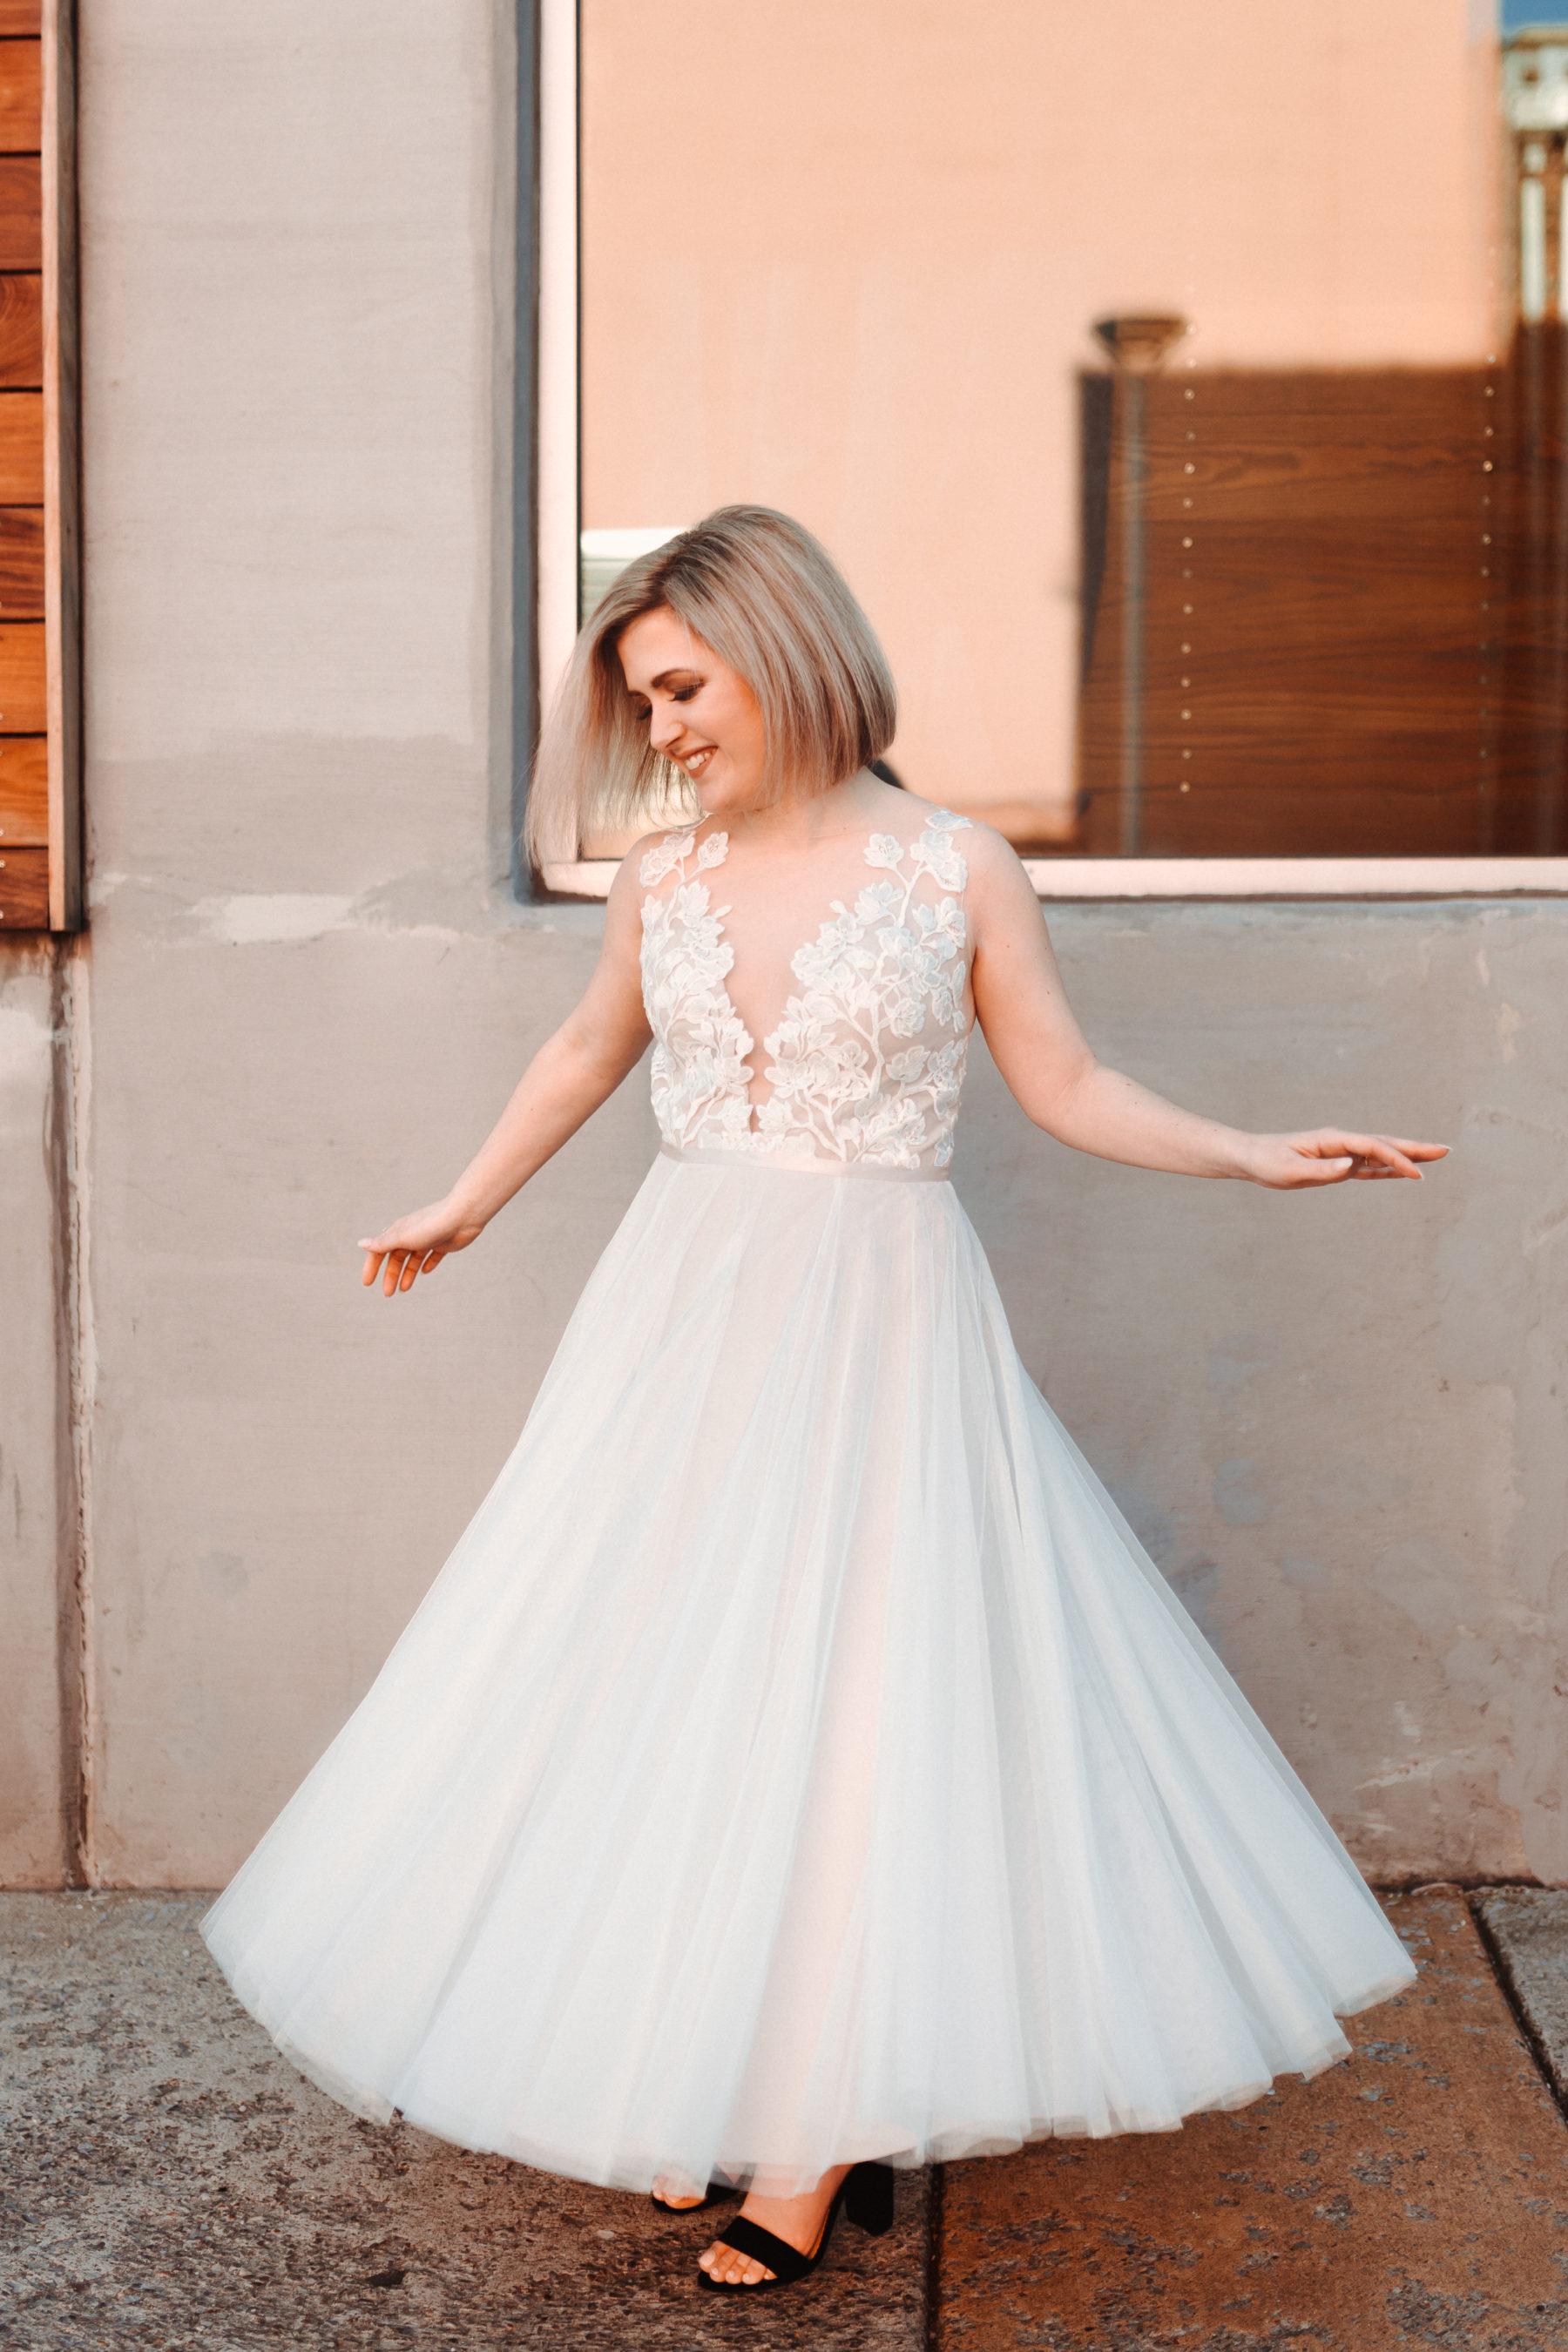 Bridal portrait: Nashville brunch elopement featured on Nashville Bride Guide